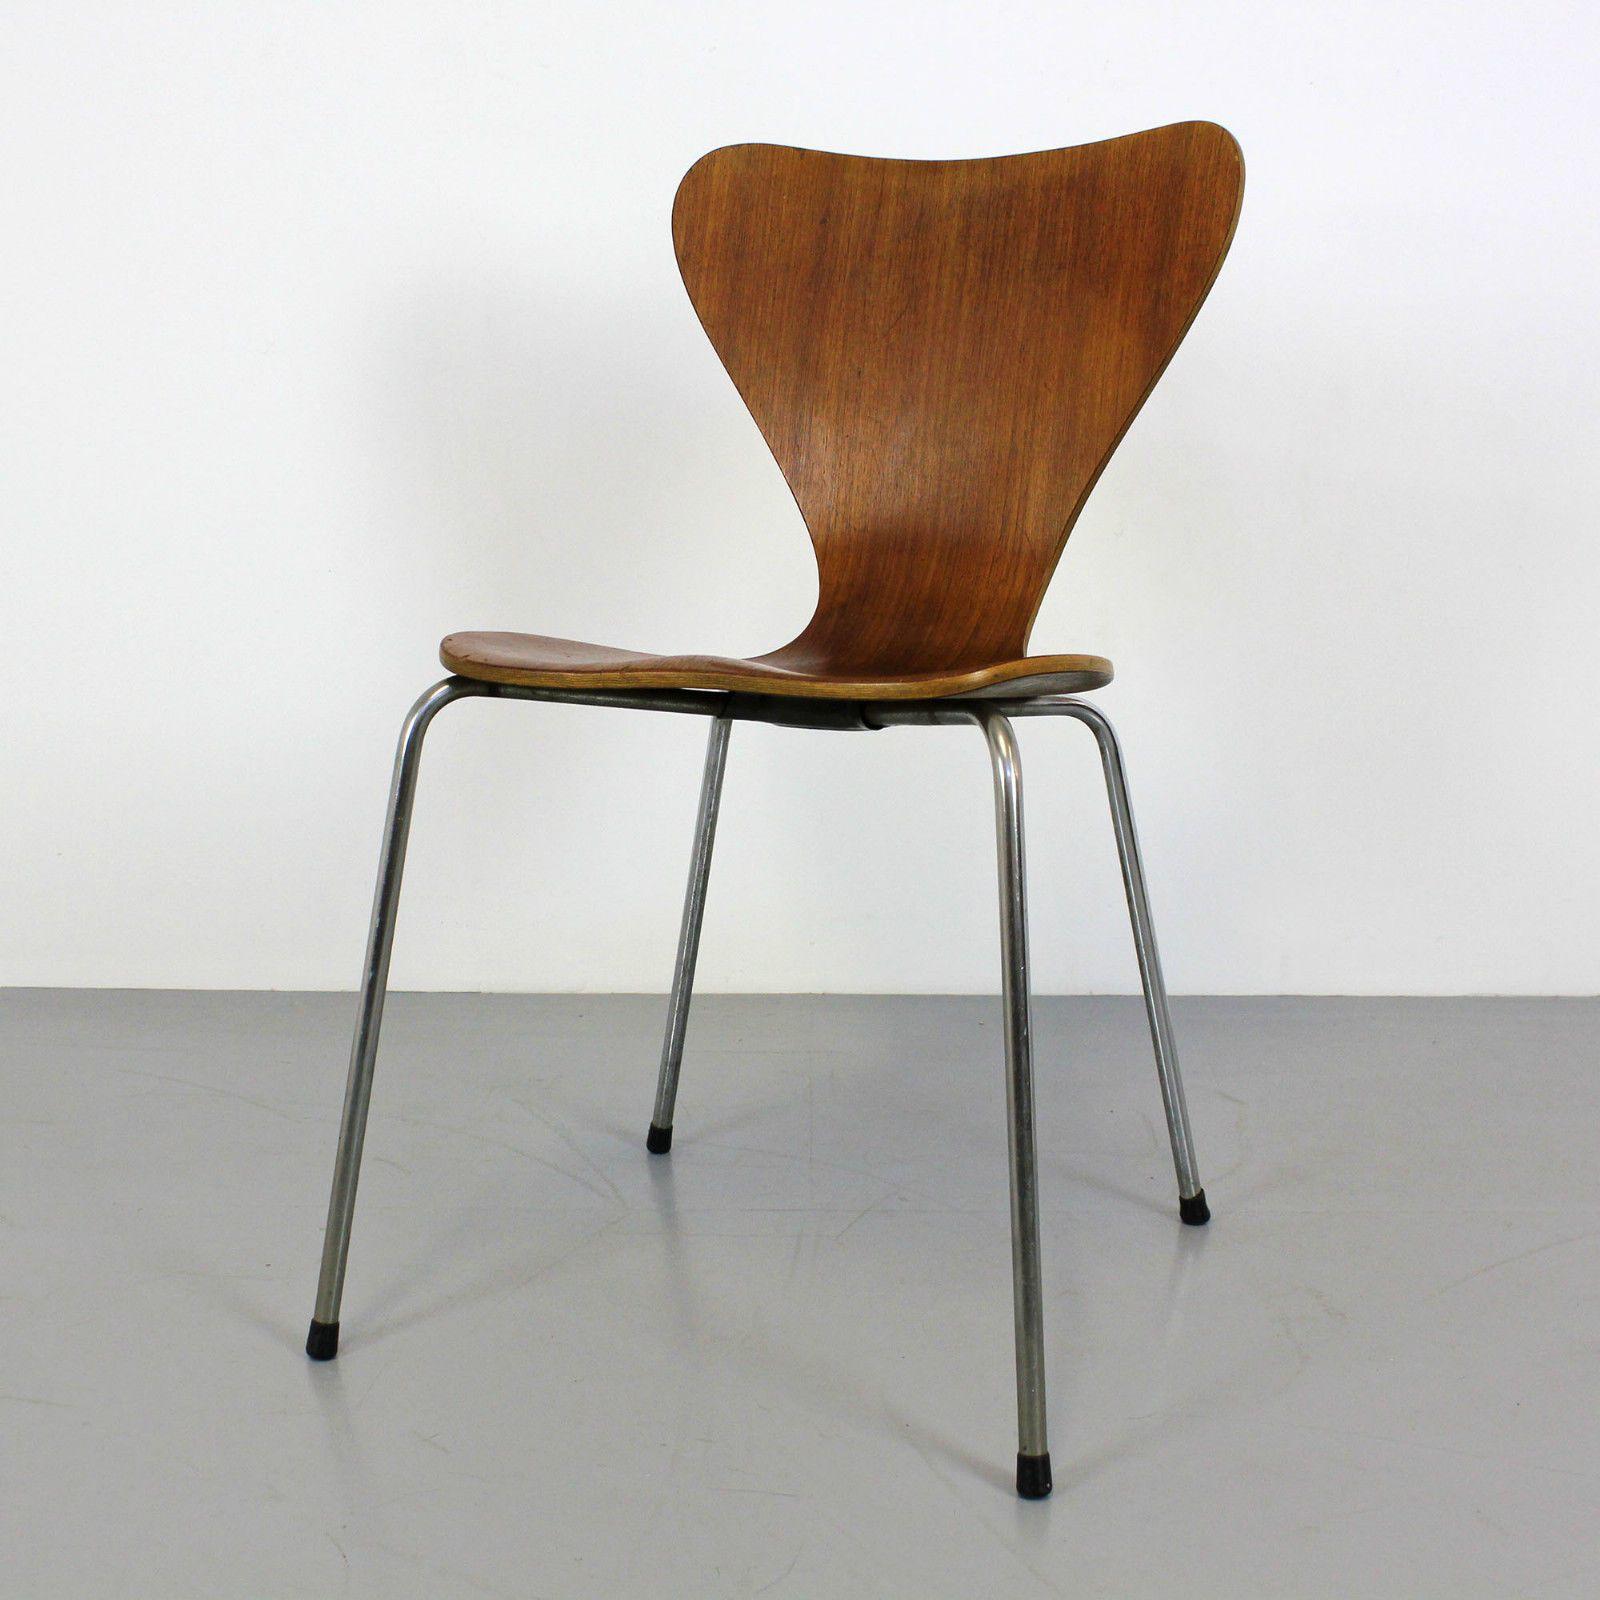 Danish Modern Plywood Chair by Arne Jacobsen Jofa M¸bler 60s